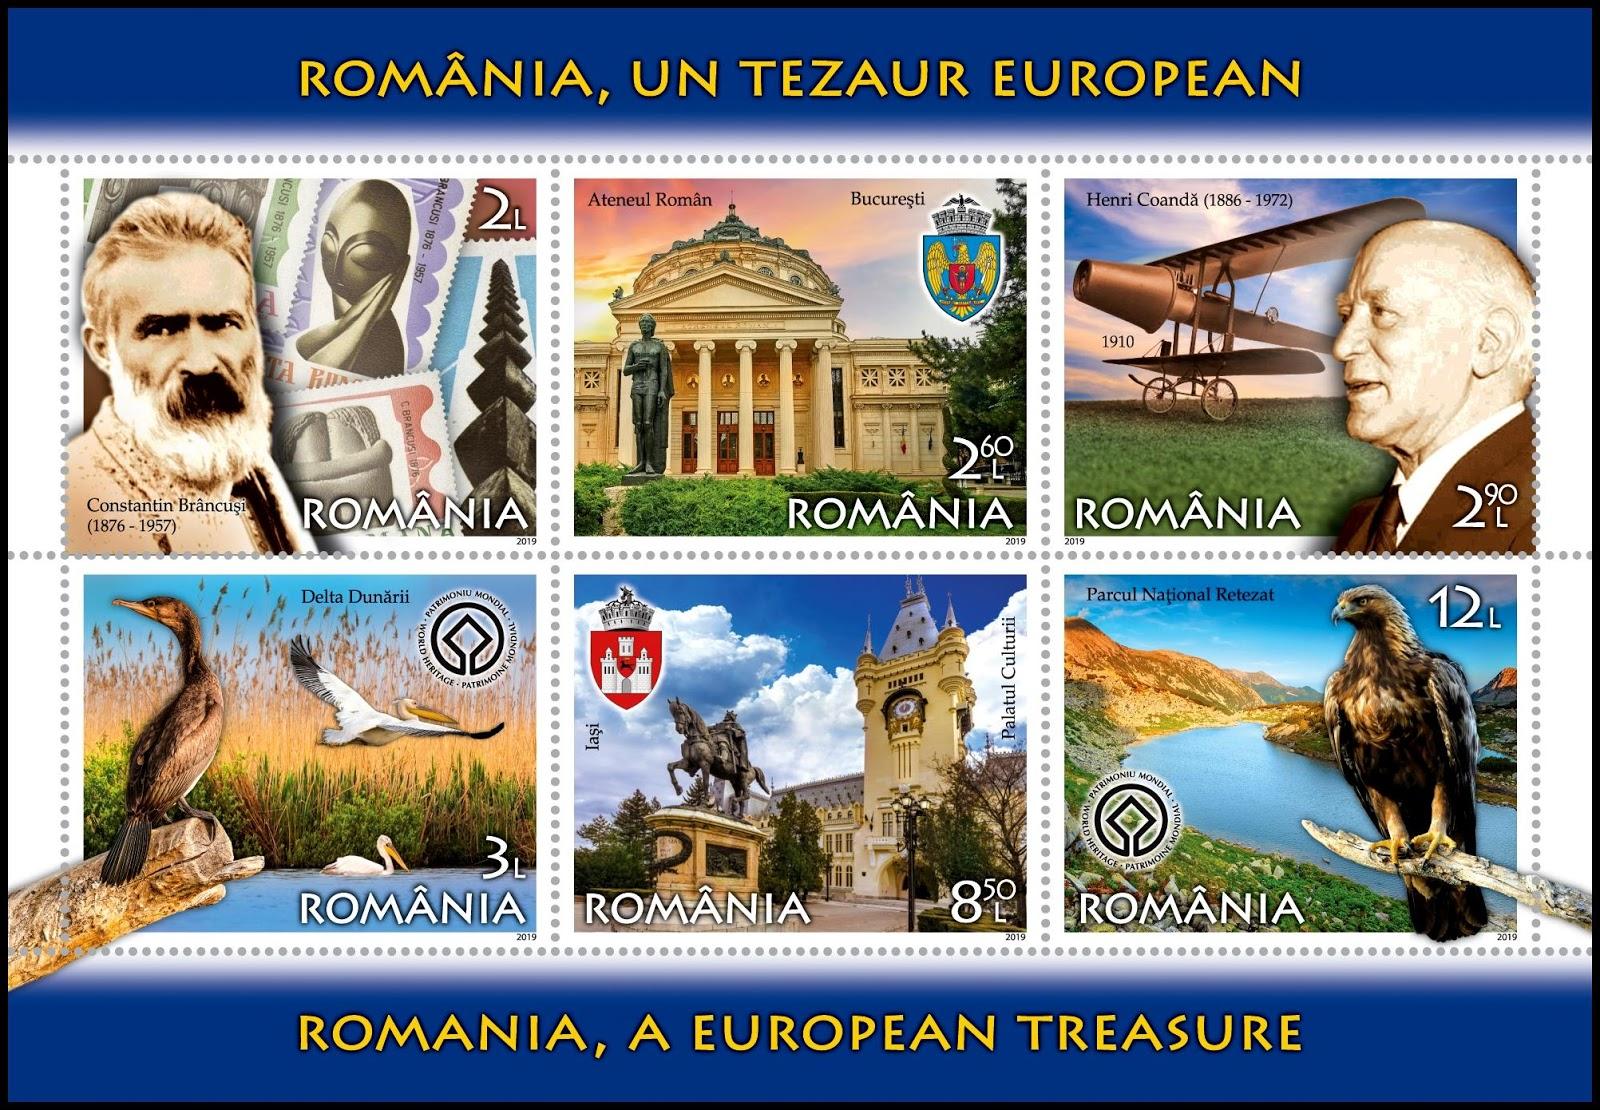 Romania - A European Treasure (January 16, 2019) mini-sheet of 6 designs